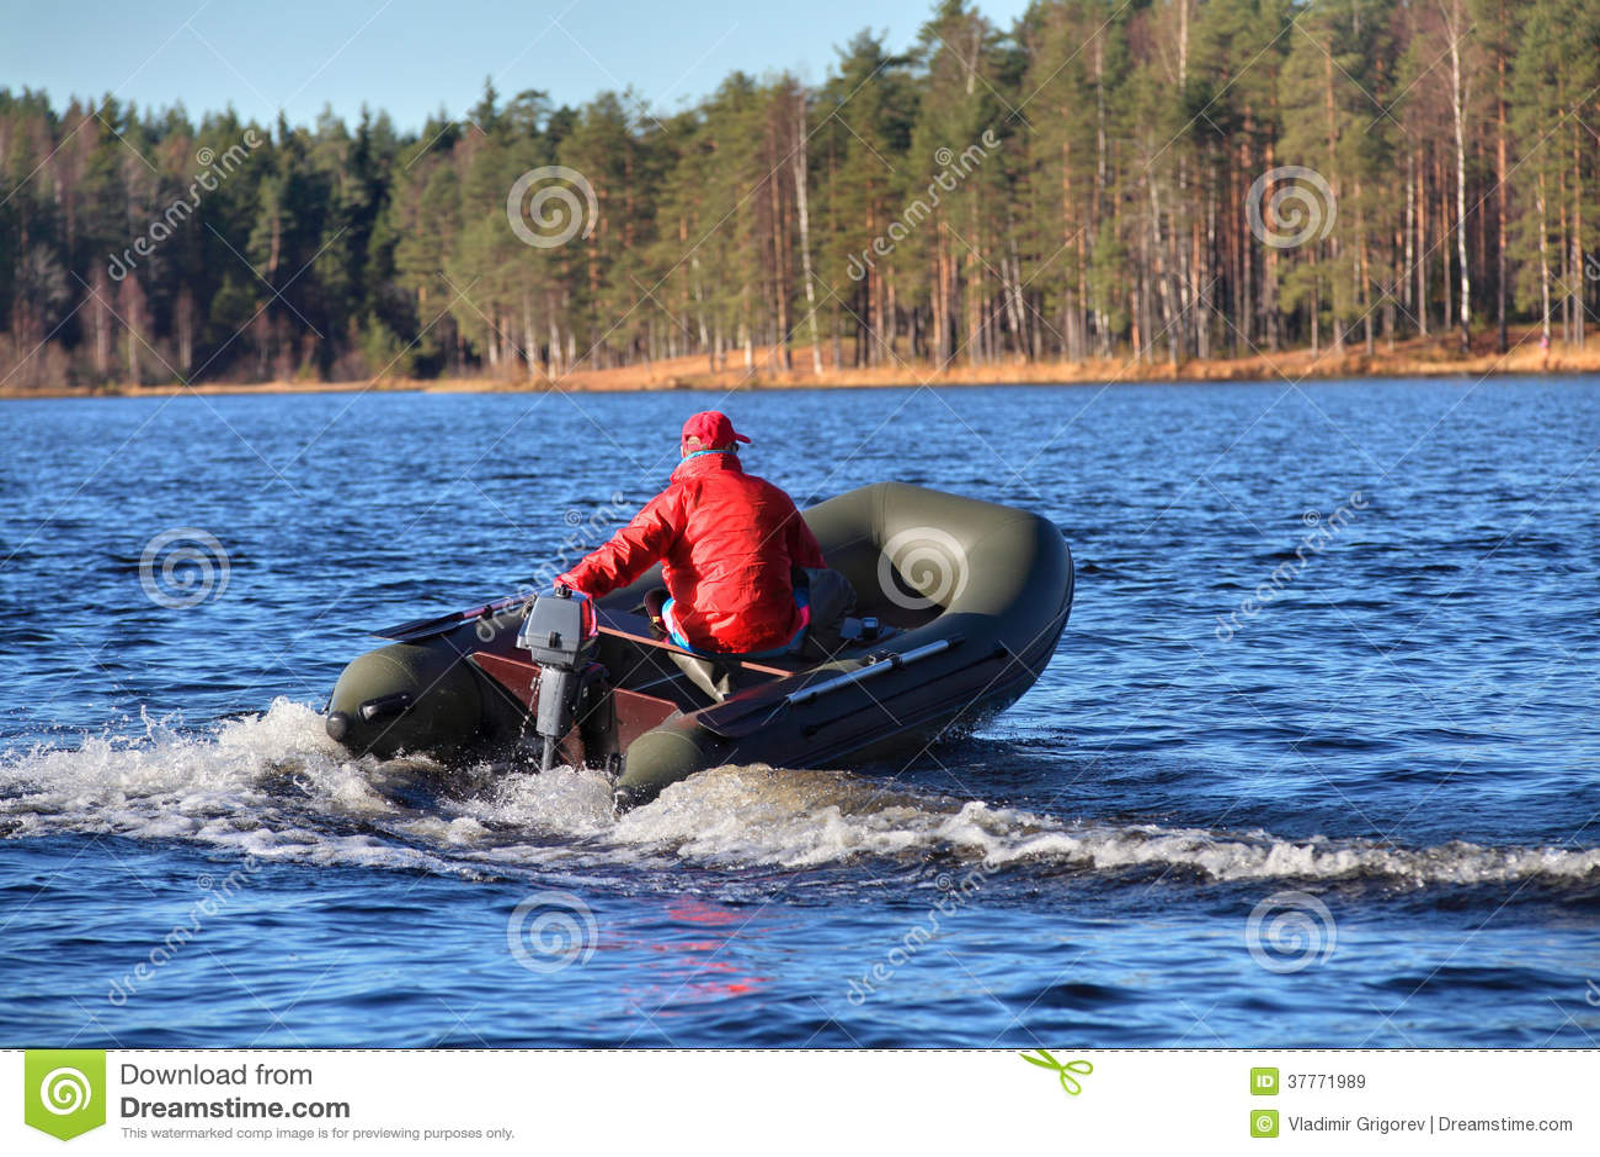 Escuro - barco de borracha verde, inflável do bote com motor, LAK da floresta